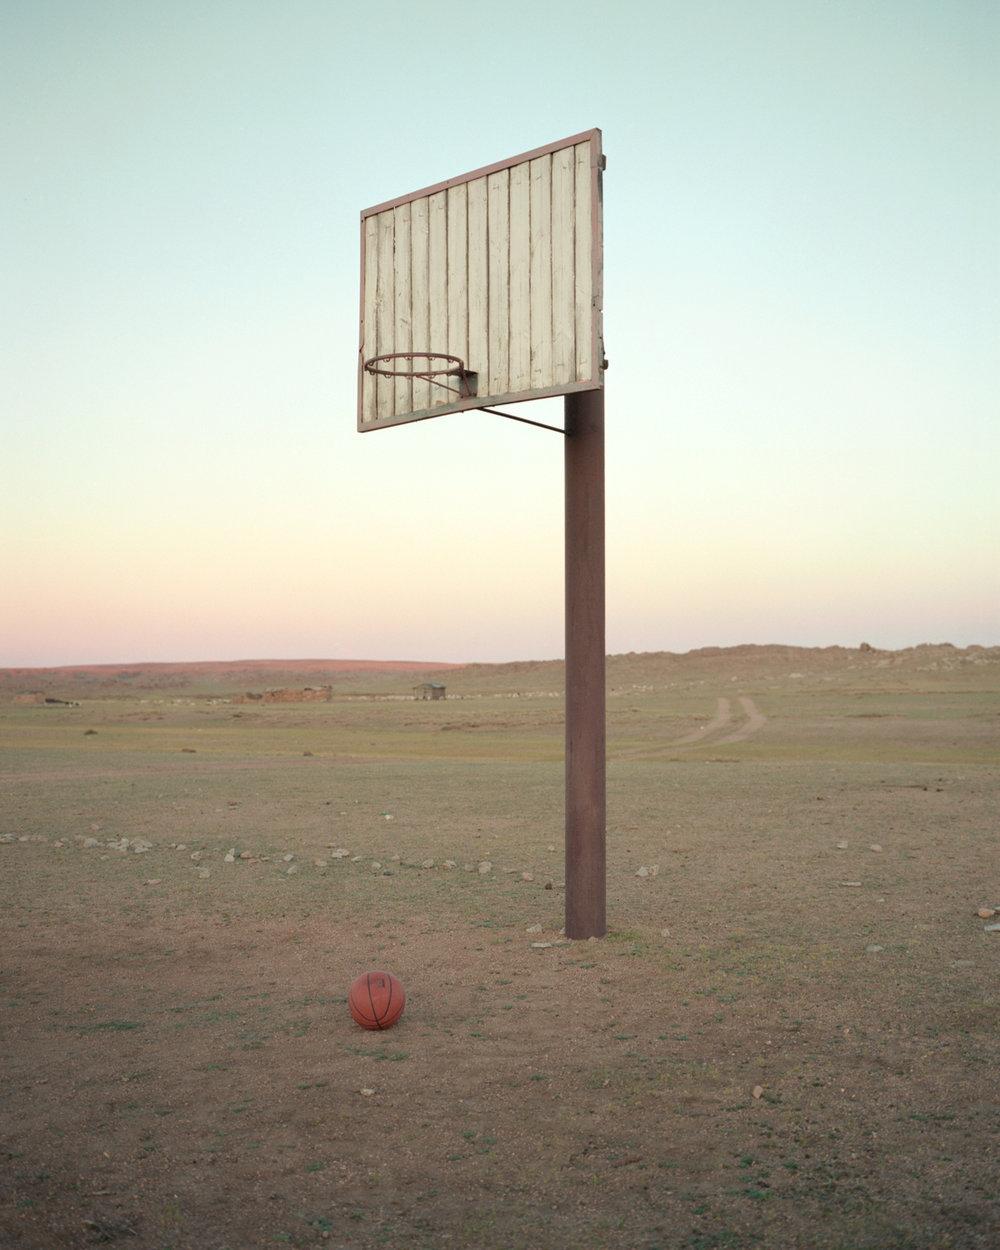 Basketball Court, Dundgovi, Mongolia, 2018 ,  Adam Ianniello